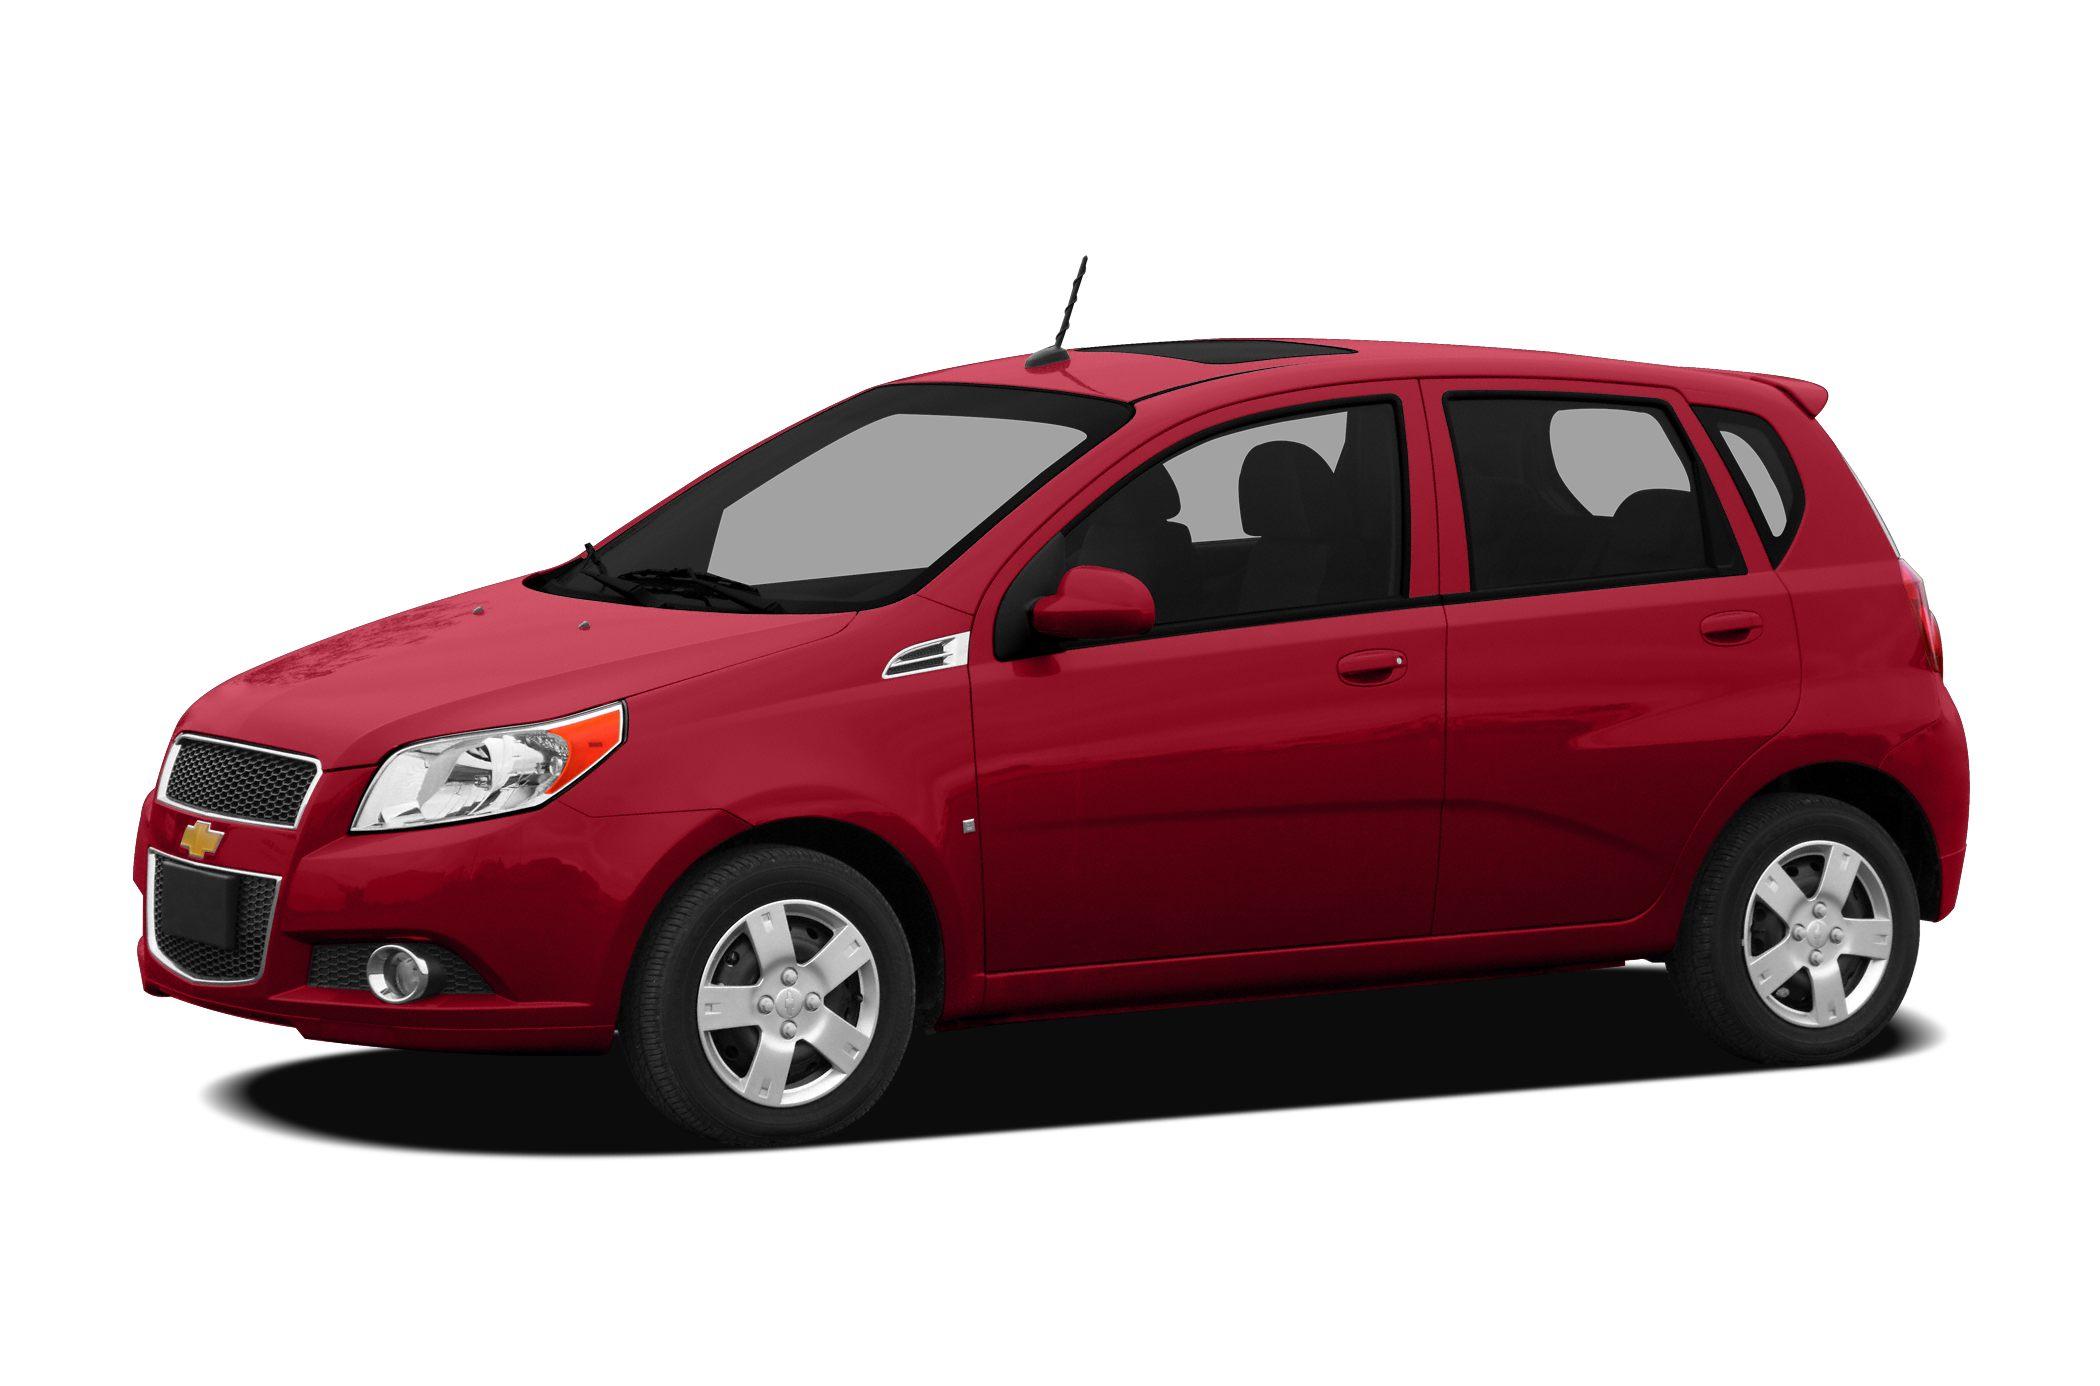 Kelebihan Toyota Aveo Murah Berkualitas